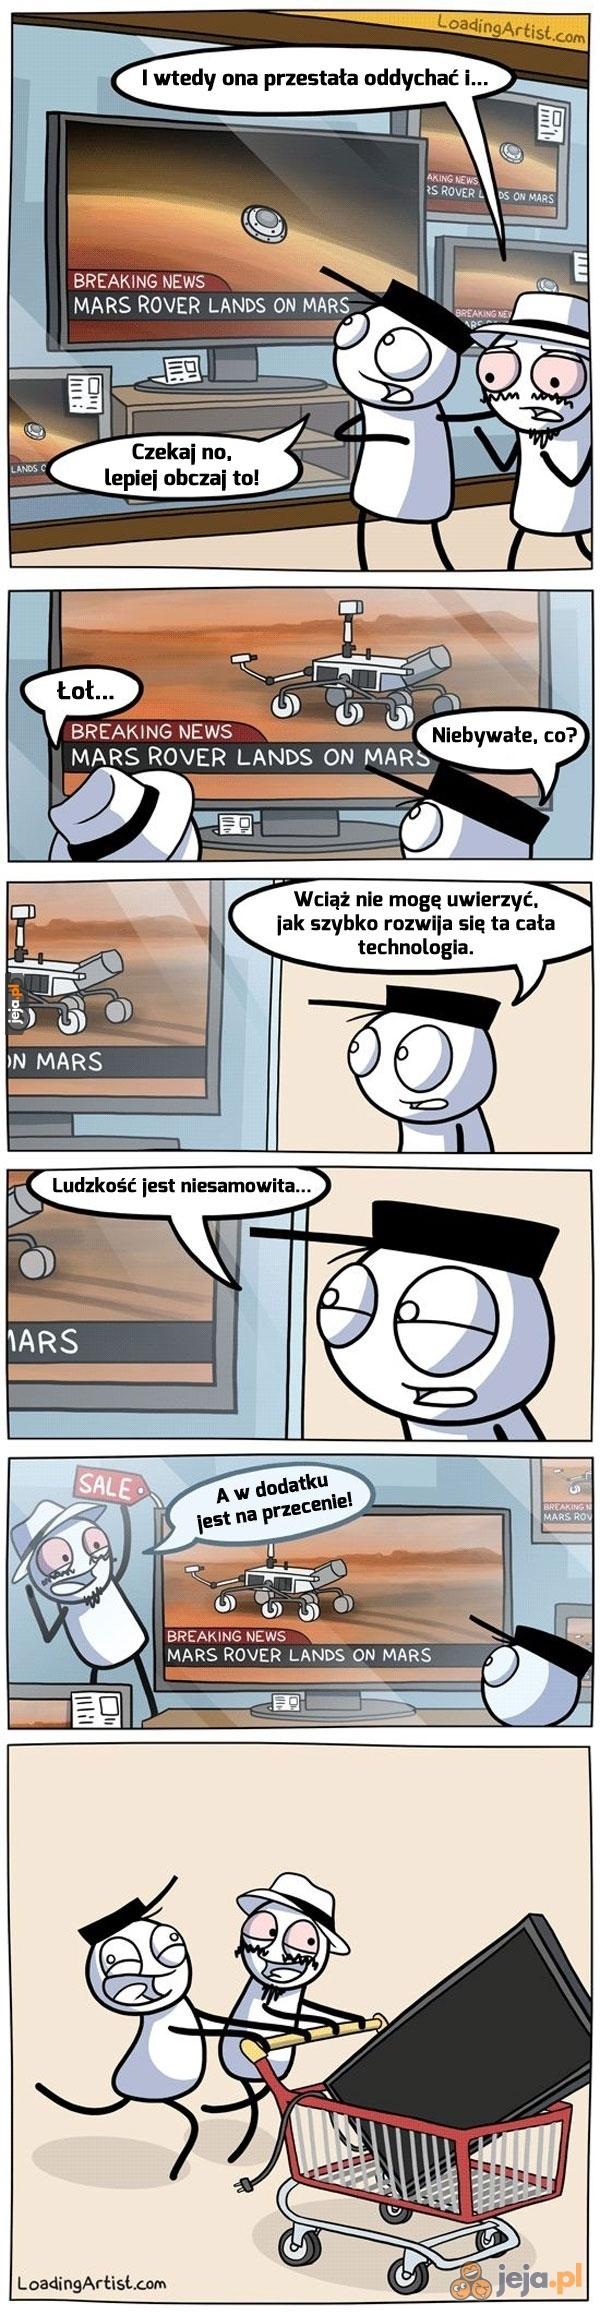 Technologia w Twoim domu